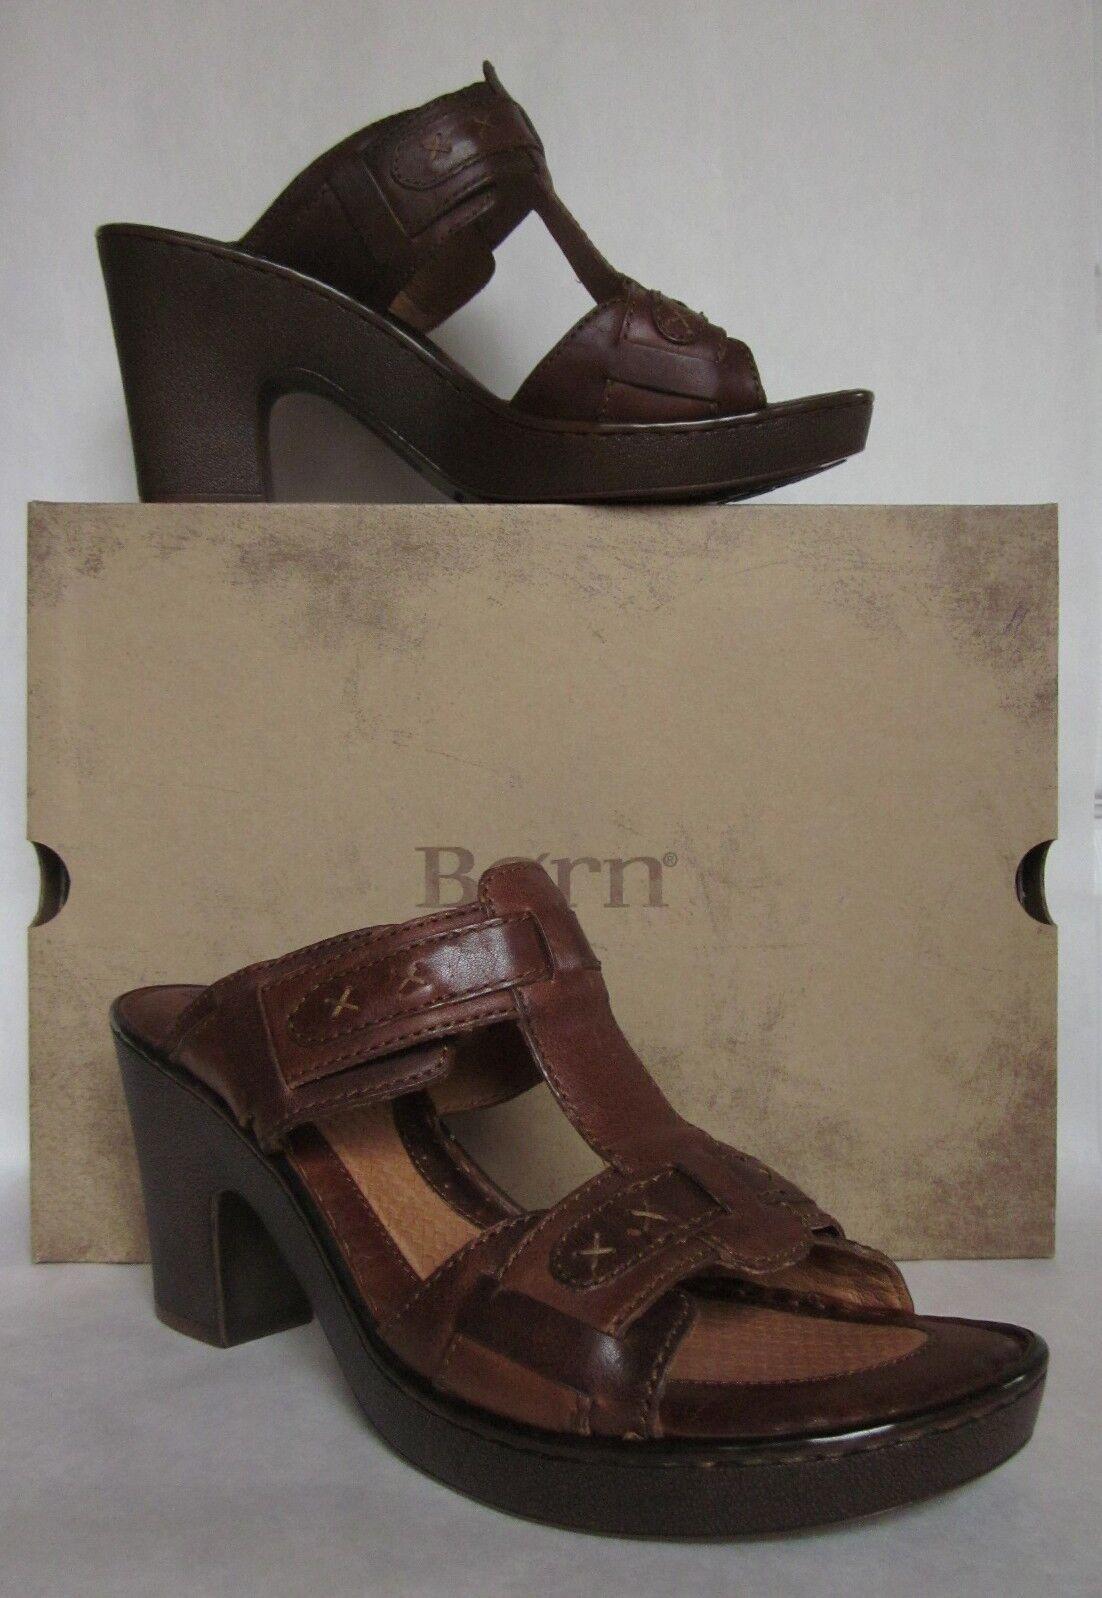 Born Beam Brown Platform Sandal - Size 11